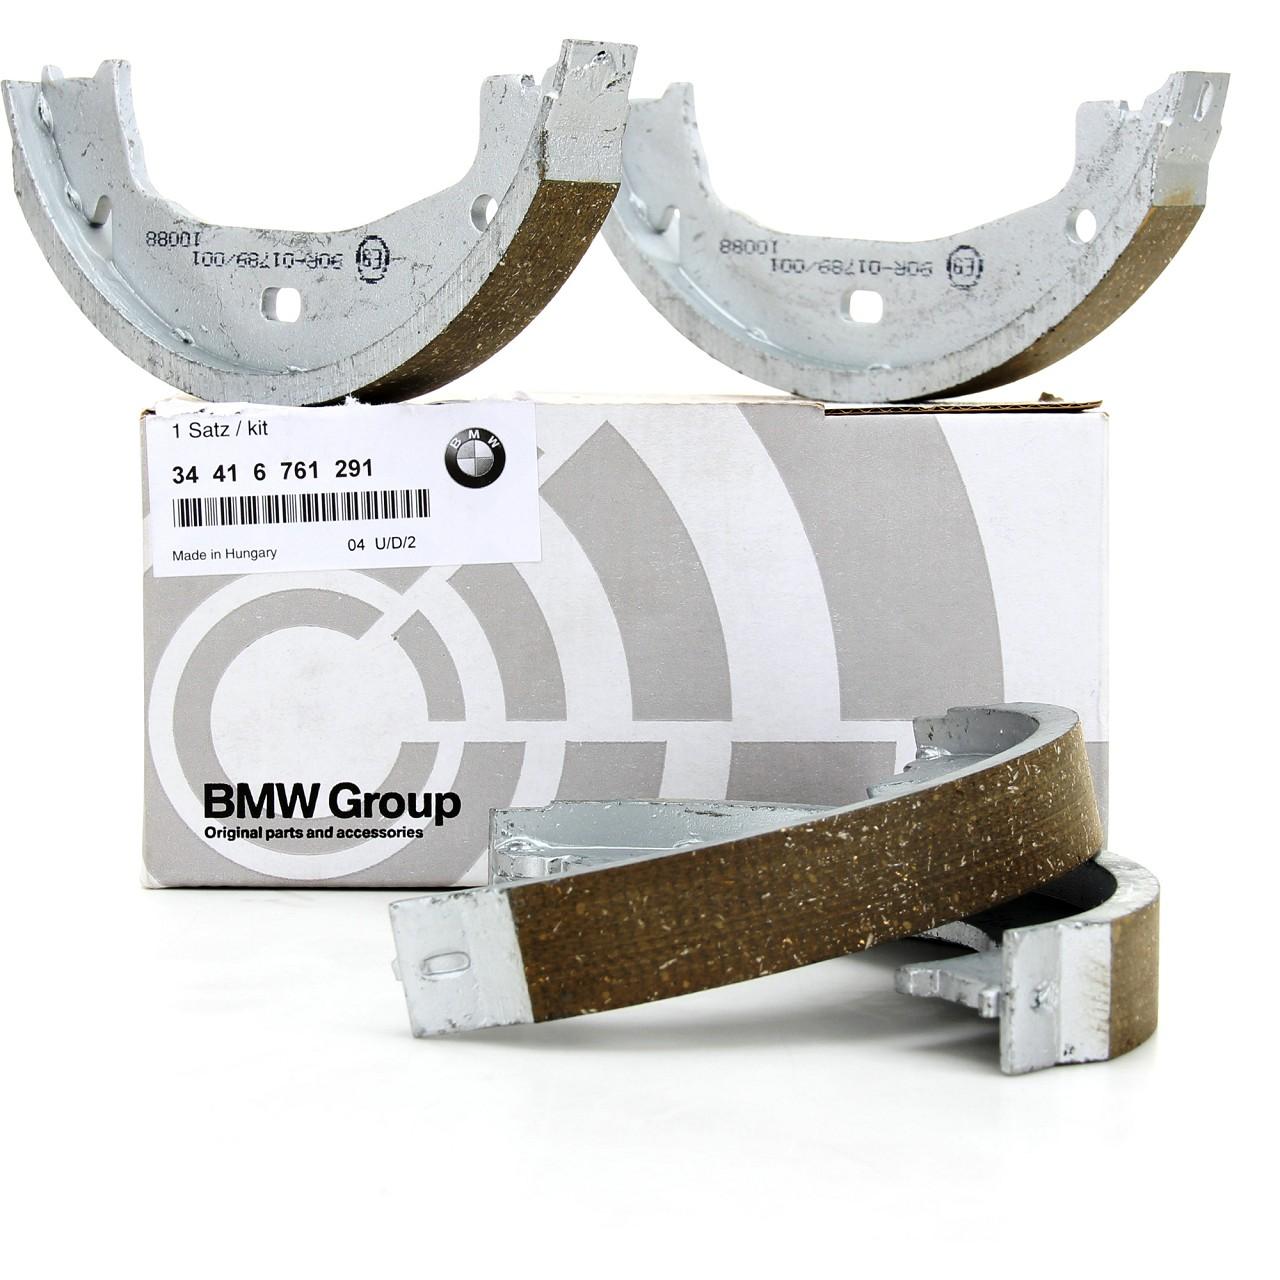 ORIGINAL BMW Bremsbacken Satz E81-E88 F20-23 E46 E90-E93 F30-36 X1 Z4 hinten